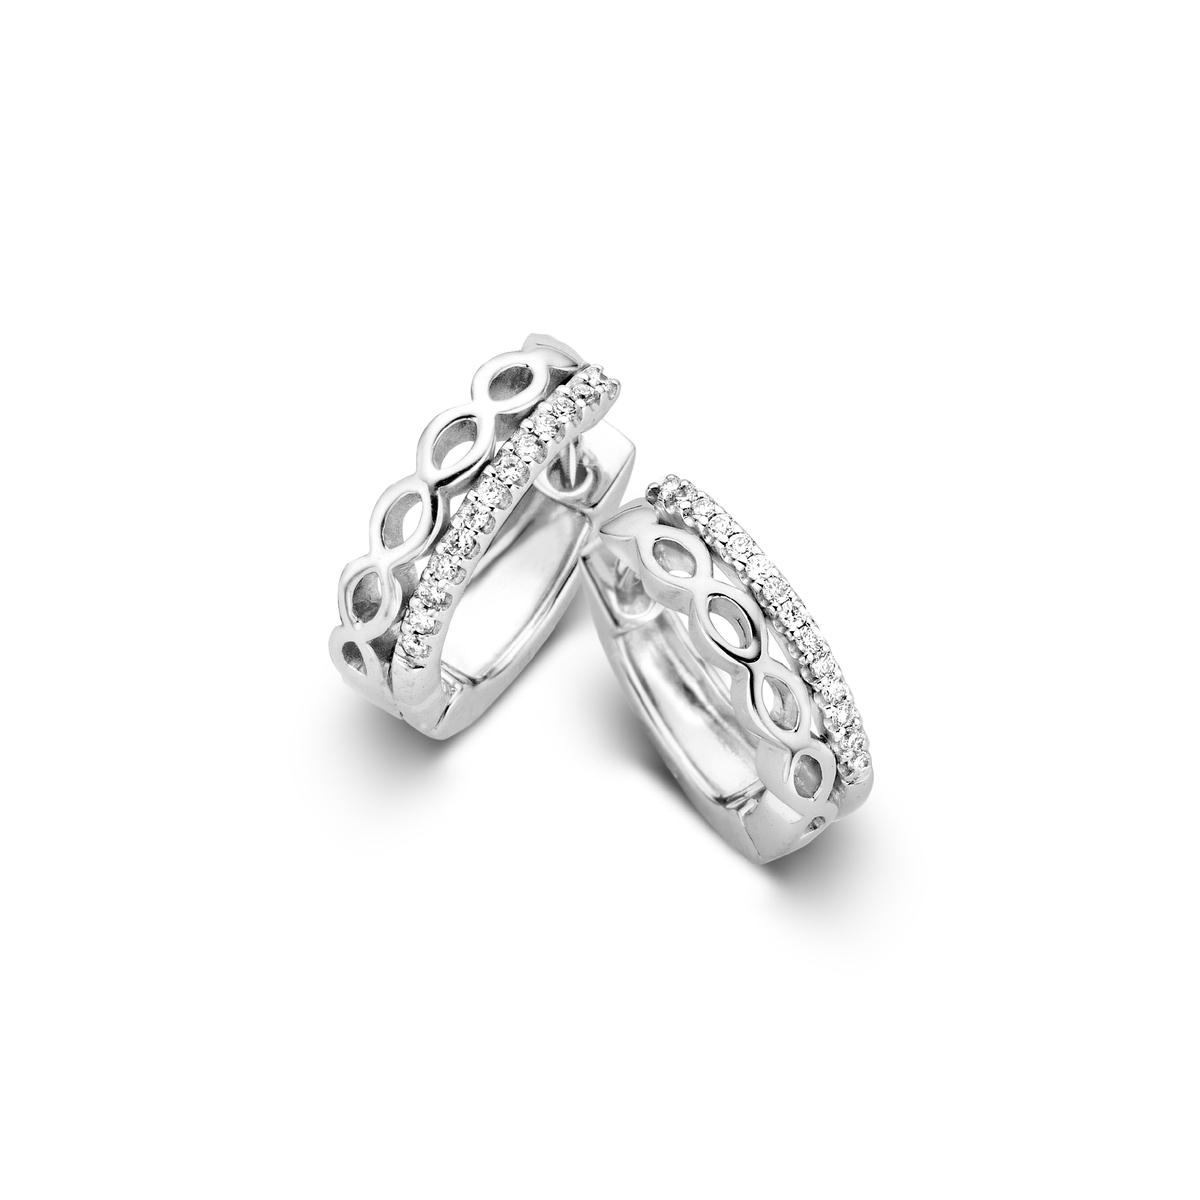 ischia earrings in white gold